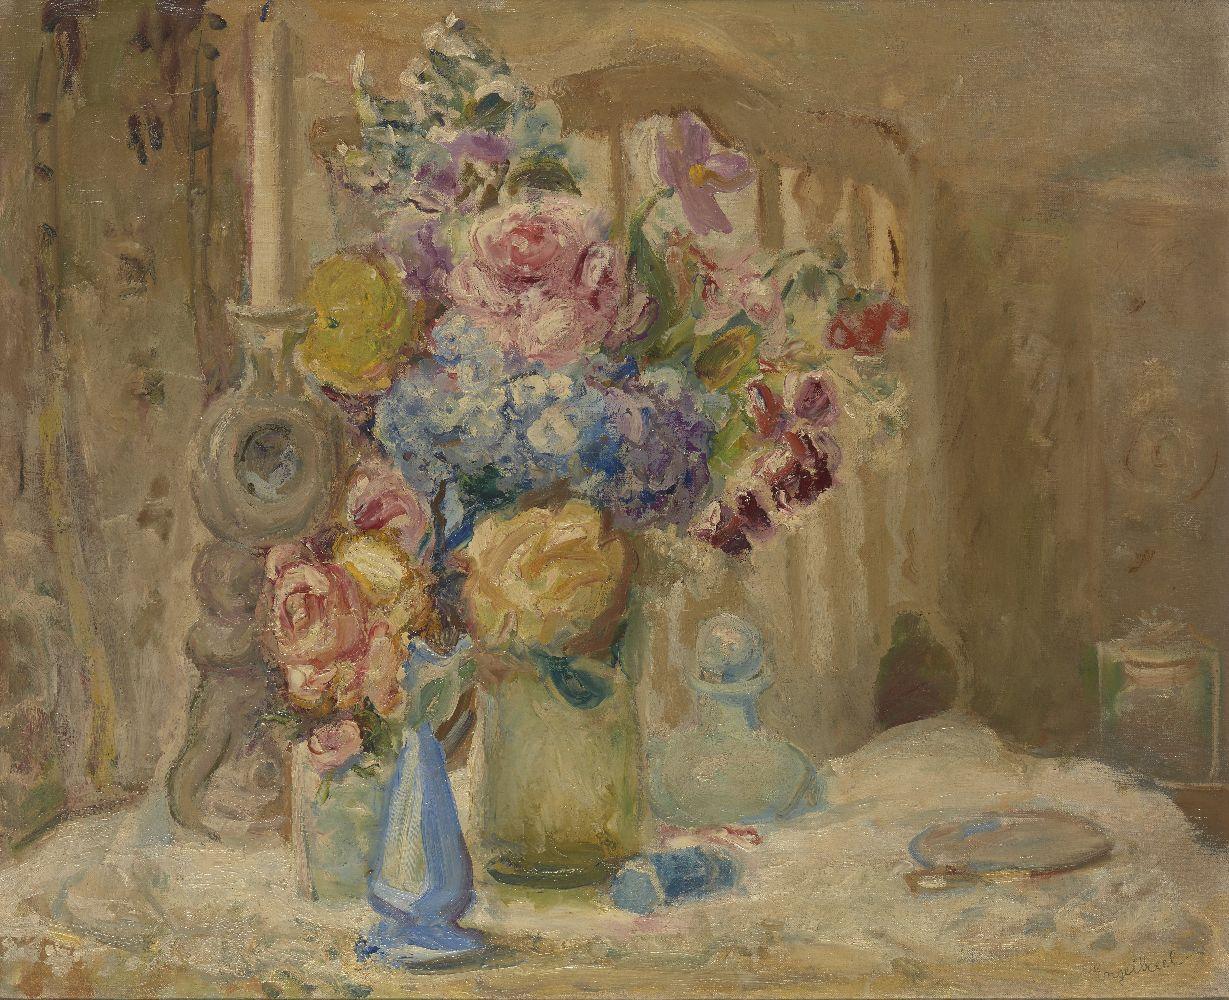 Florence Engelbach, Spanish/British 1872-1951- Flowers; oil on canvas, signed, 60x71.5cm (ARR)Please